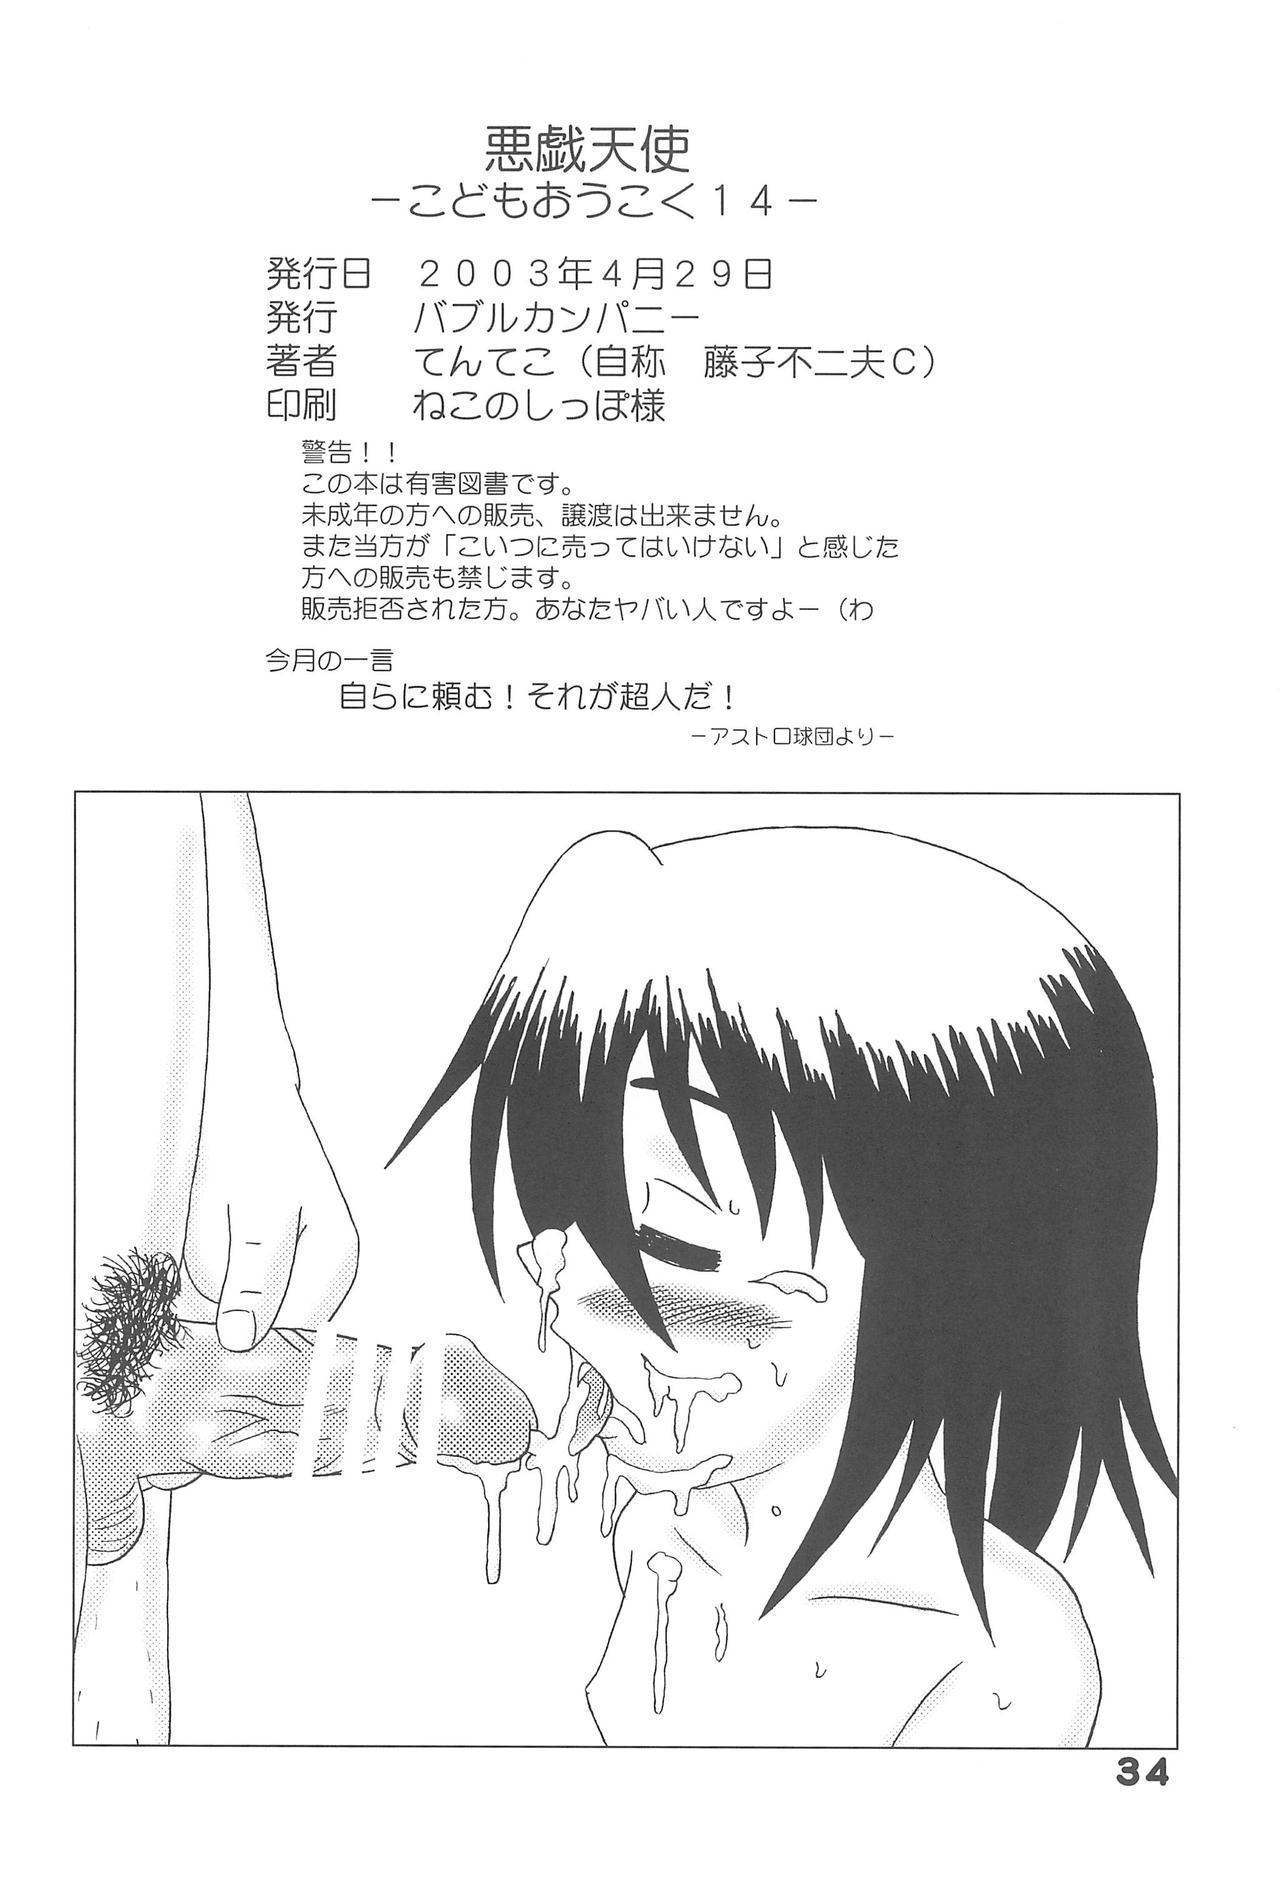 Itazura Tenshi 33